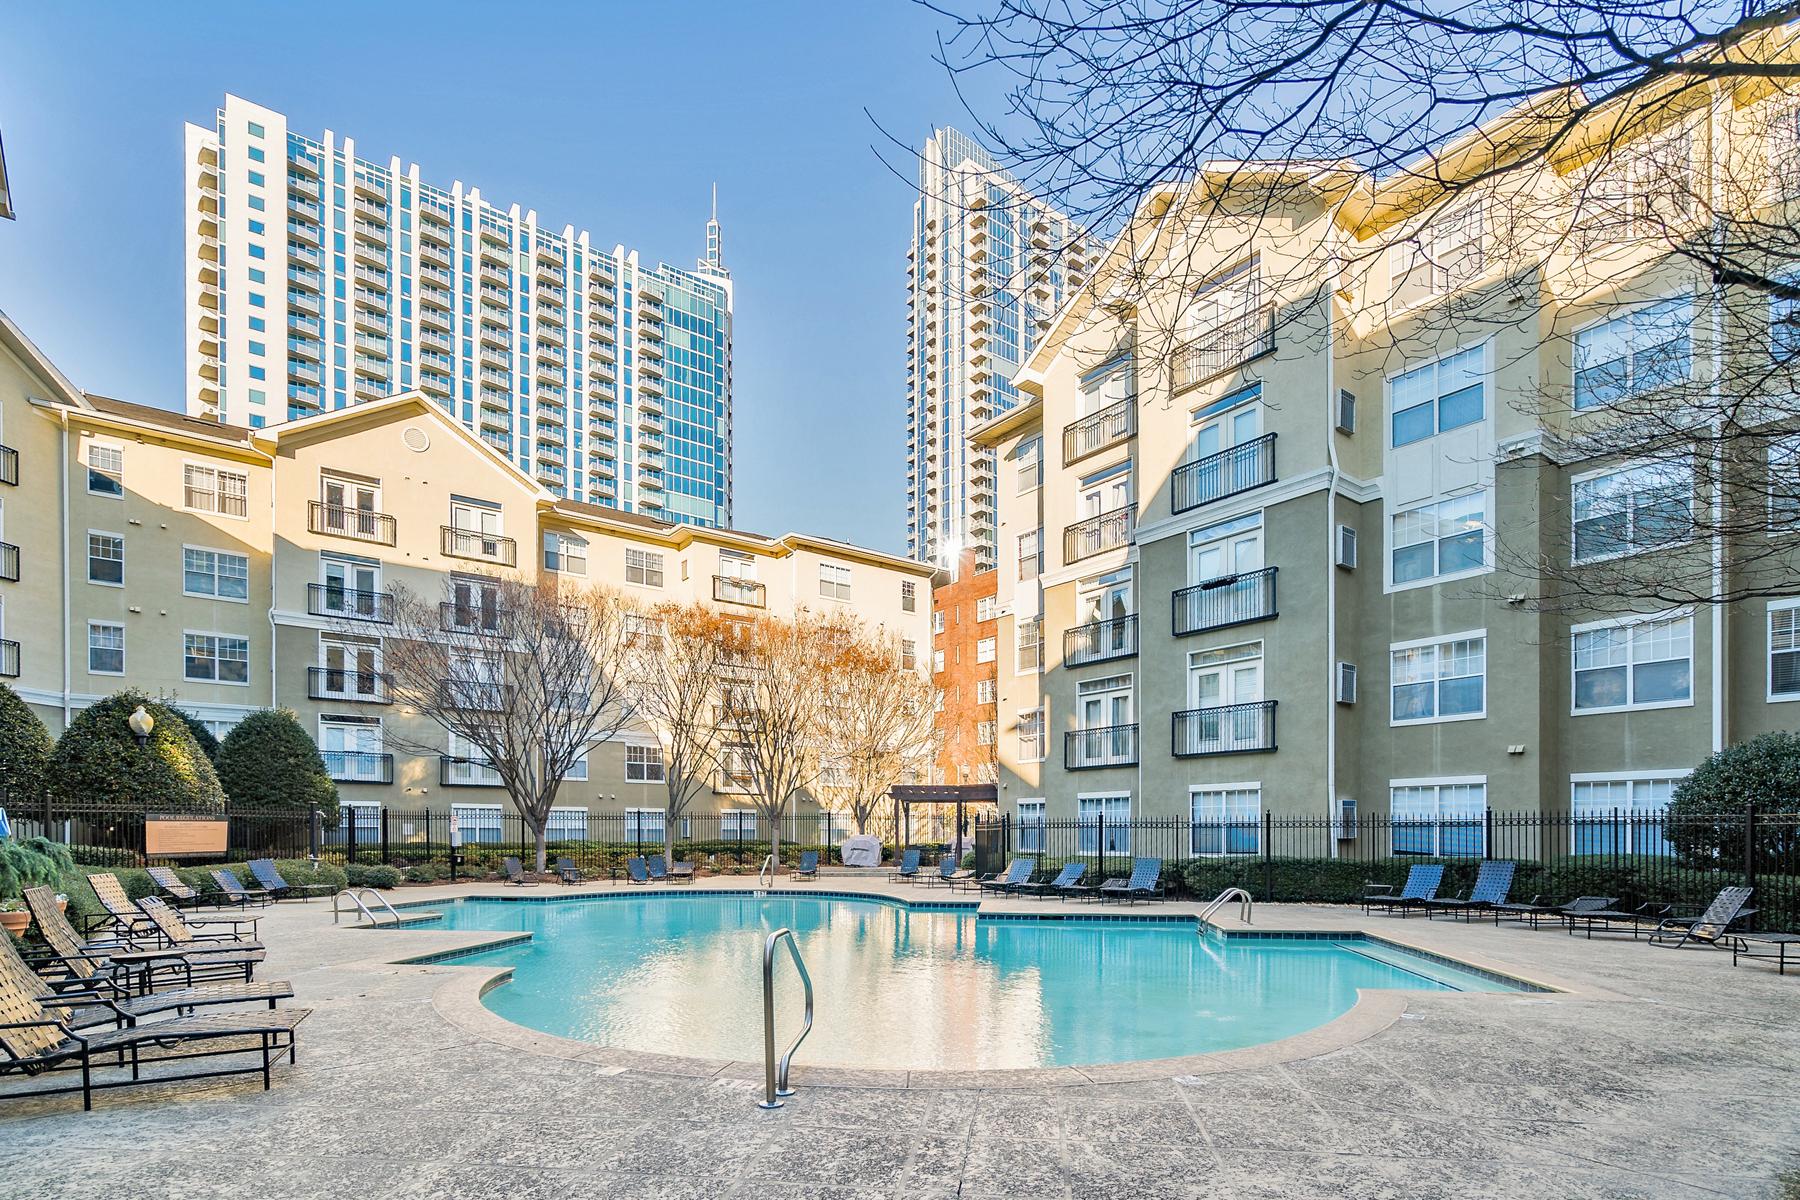 شقة بعمارة للـ Rent في Cornerstone Village Rental 800 Peachtree Street NE Unit 8417, Atlanta, Georgia, 30308 United States